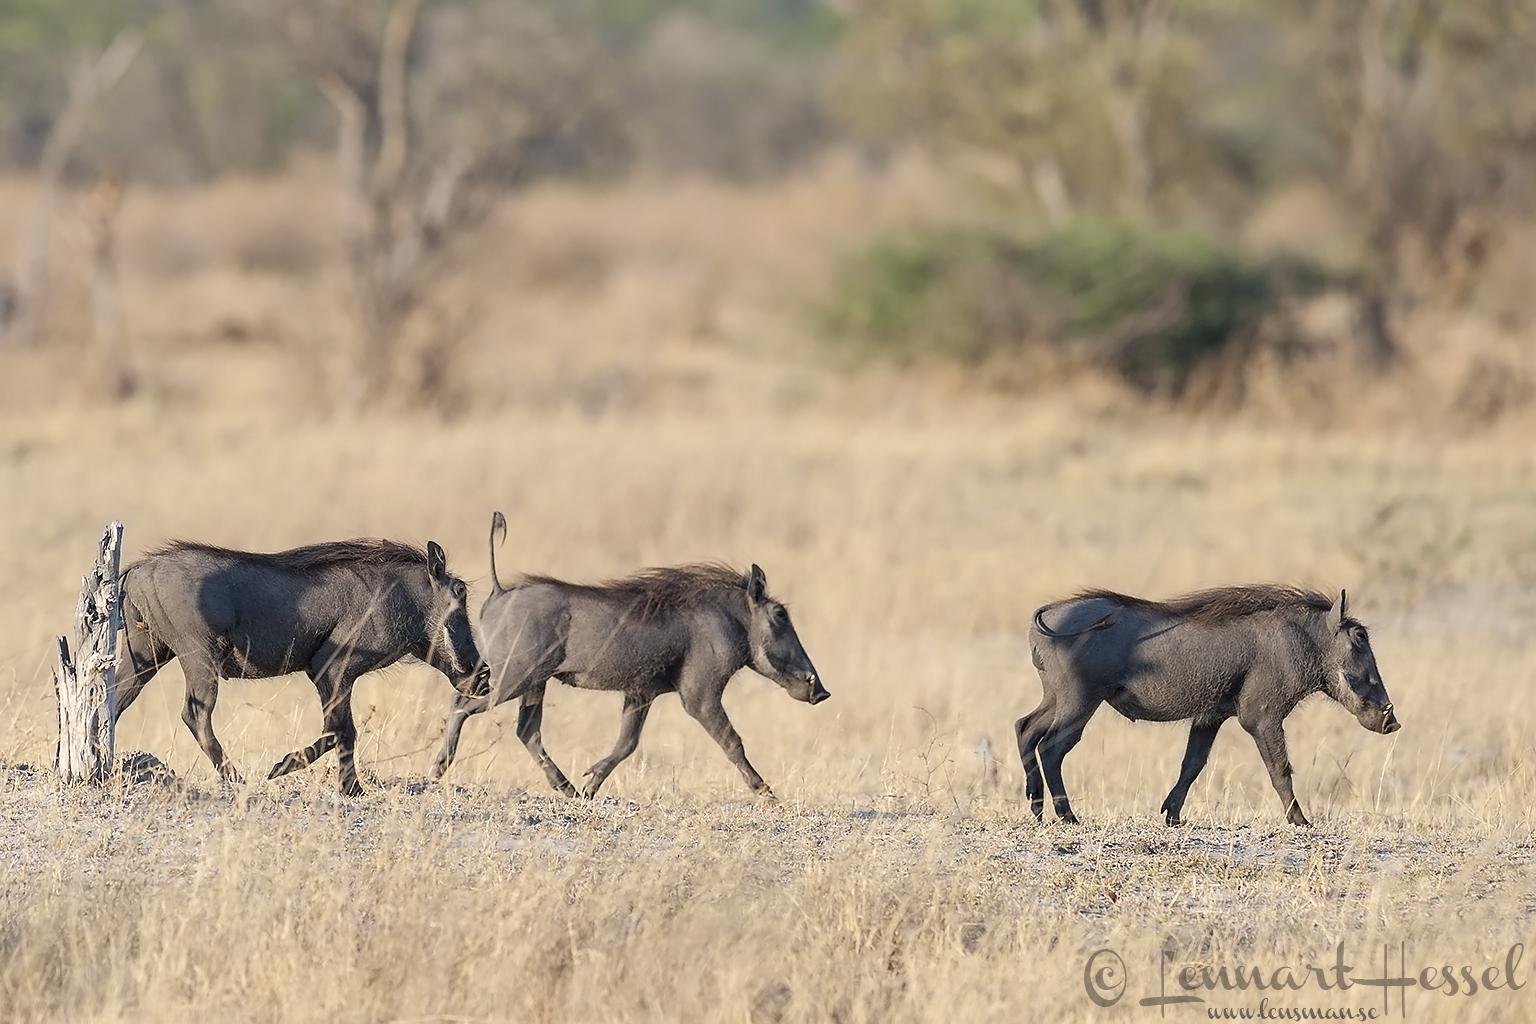 Pumbas in Moremi Game Reserve, Botswana